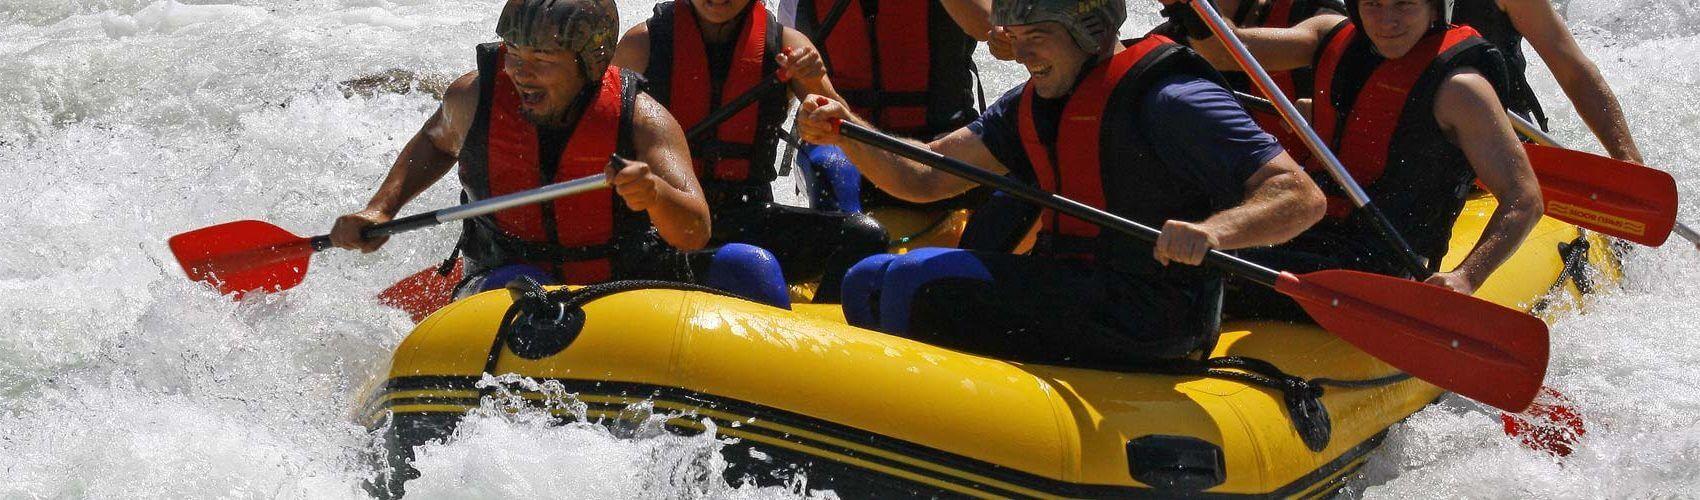 Isar Rafting - Bootstour mit dem Schlauchboot ab Lenggries bei Bad Tölz in Bayern, Isar Rafting buchen